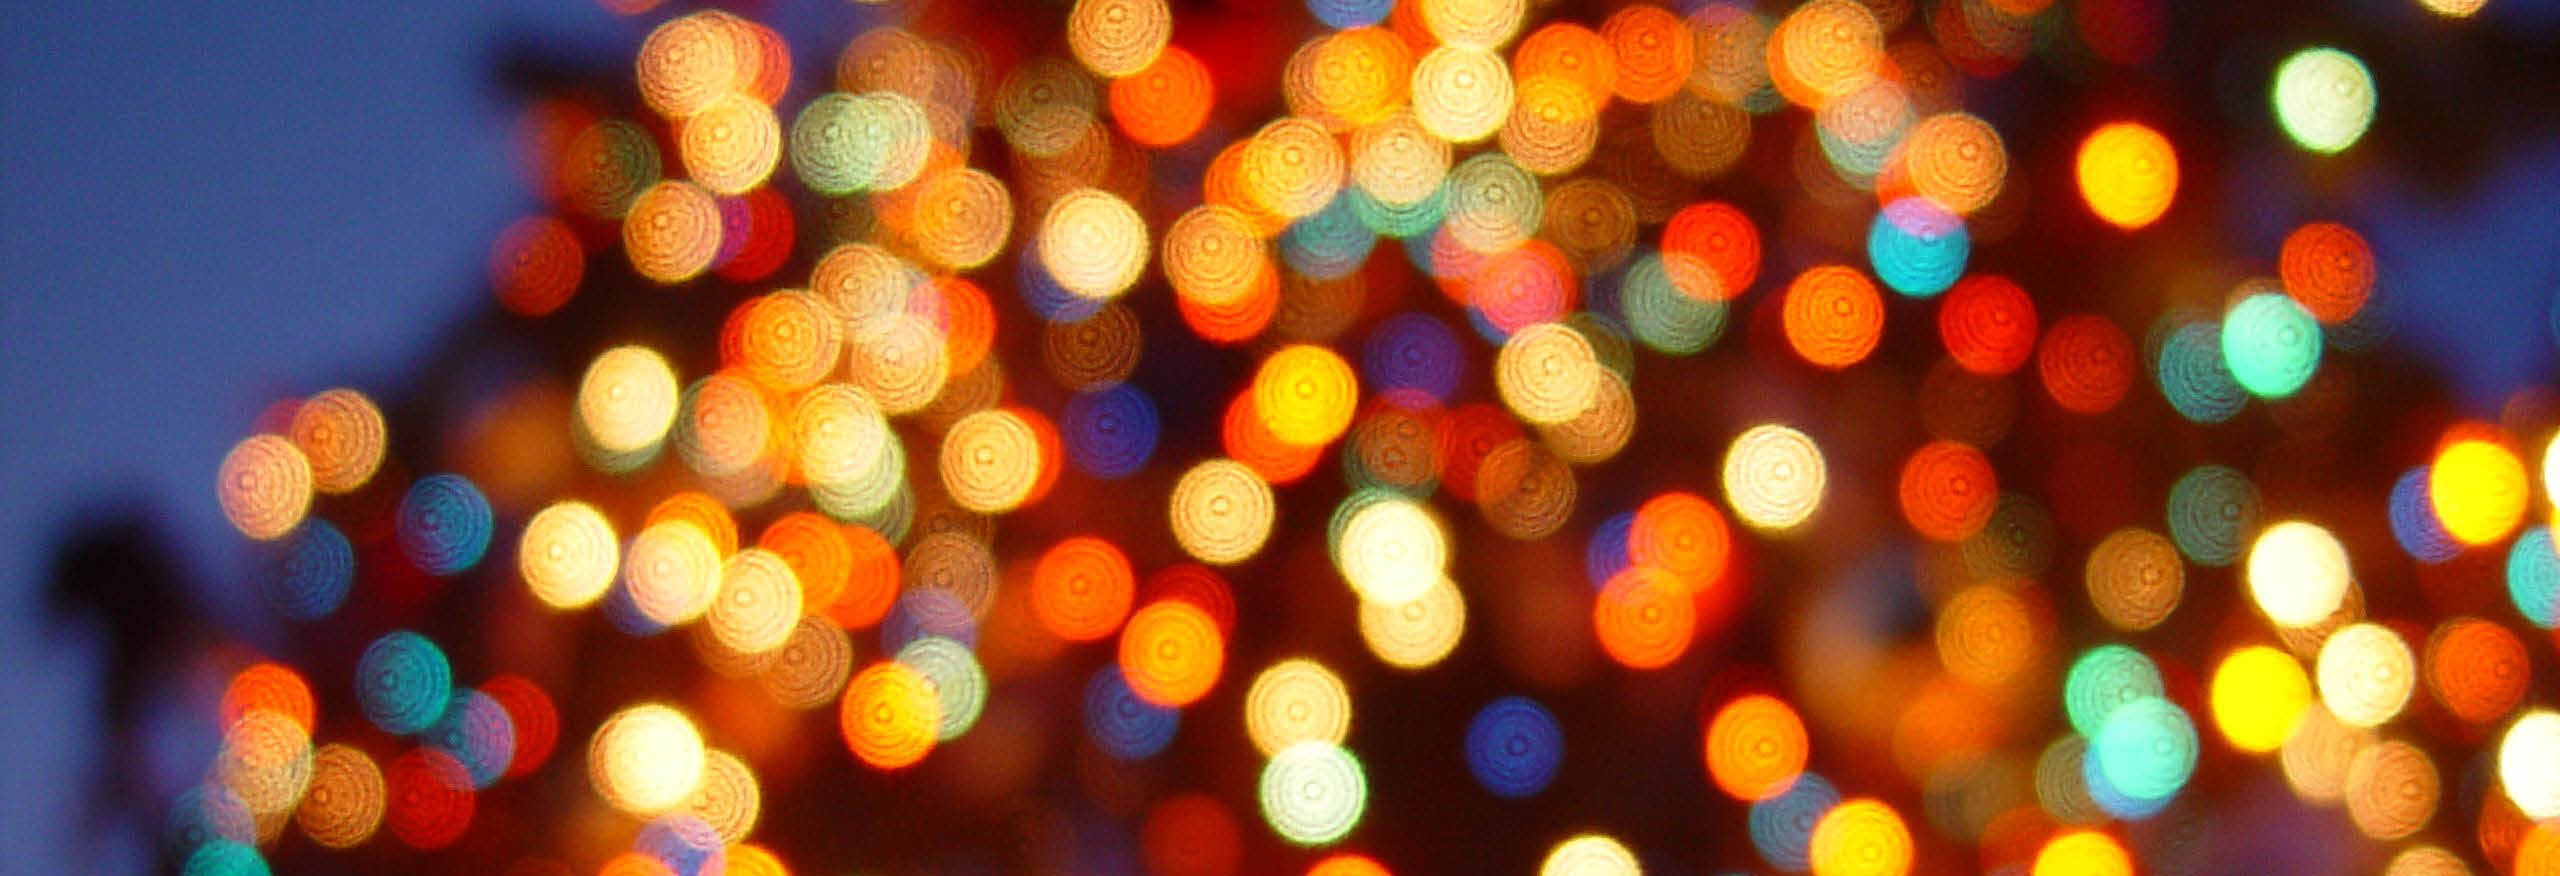 Buckley Chamber main banner image - Buckley, WA - Annual Tree Lighting & Christmas Tree Auction